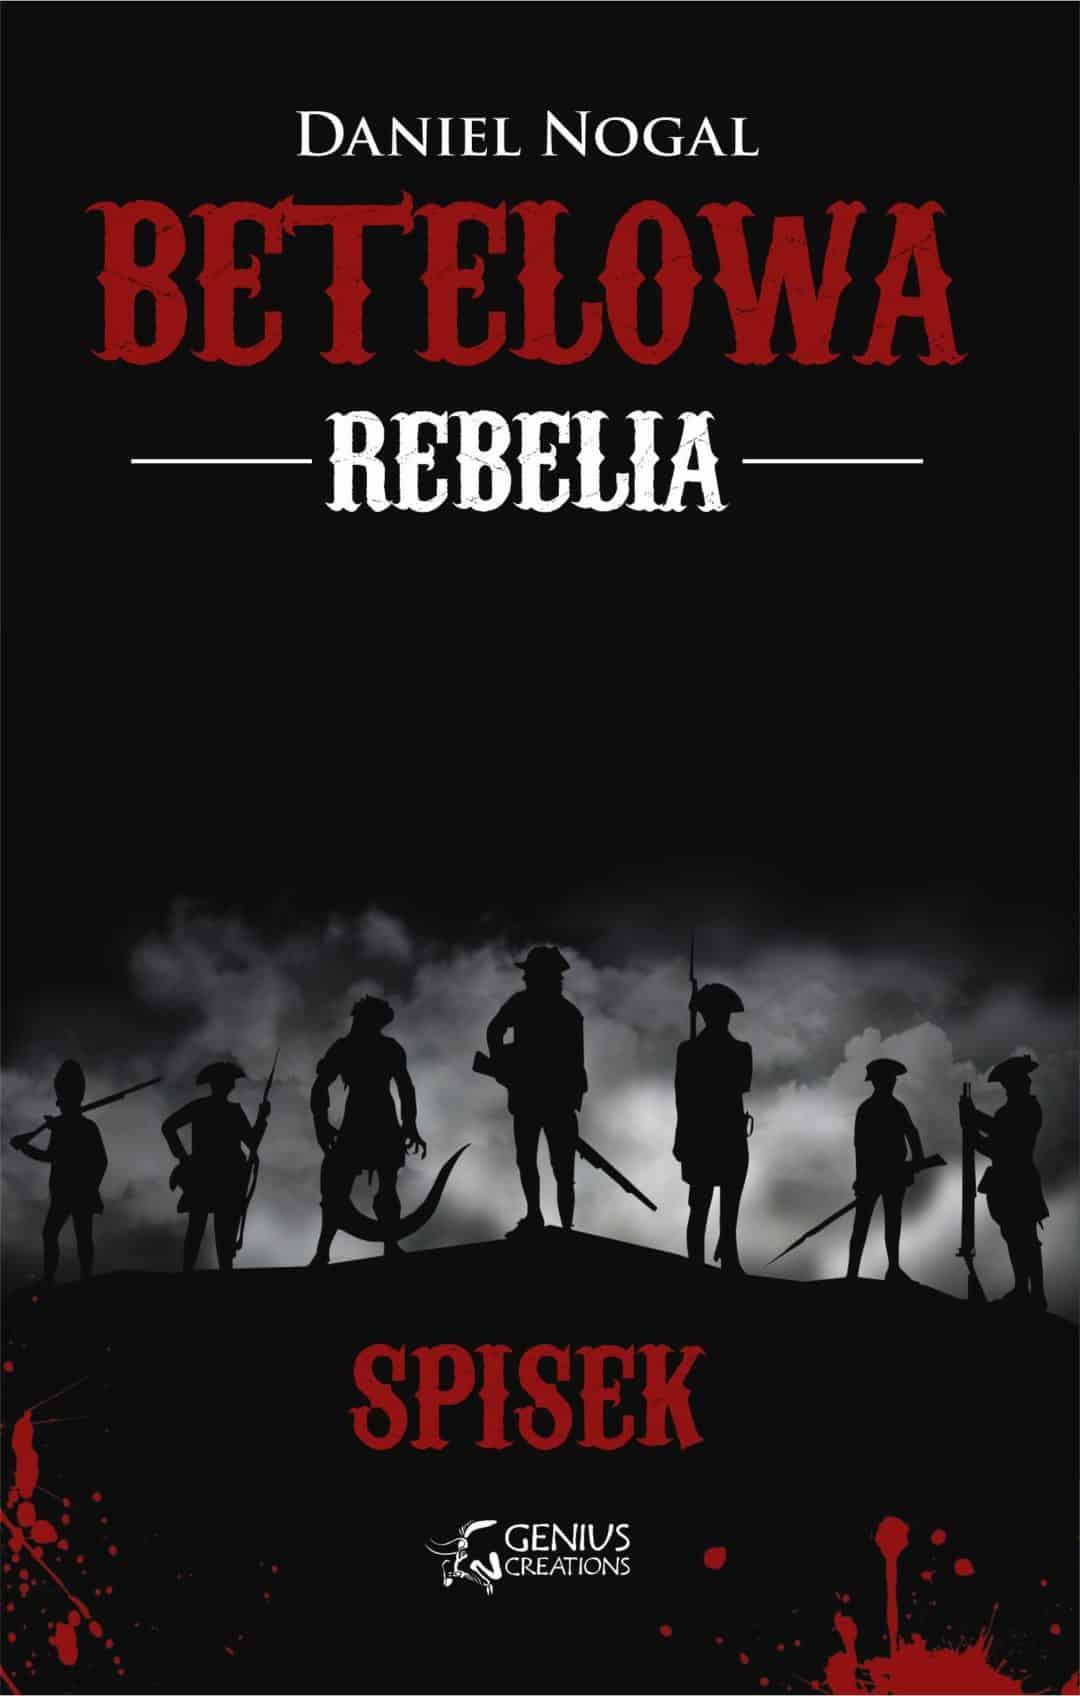 Betelowa rebelia: Spisek - Daniel Nogal © Jacek Łukawski